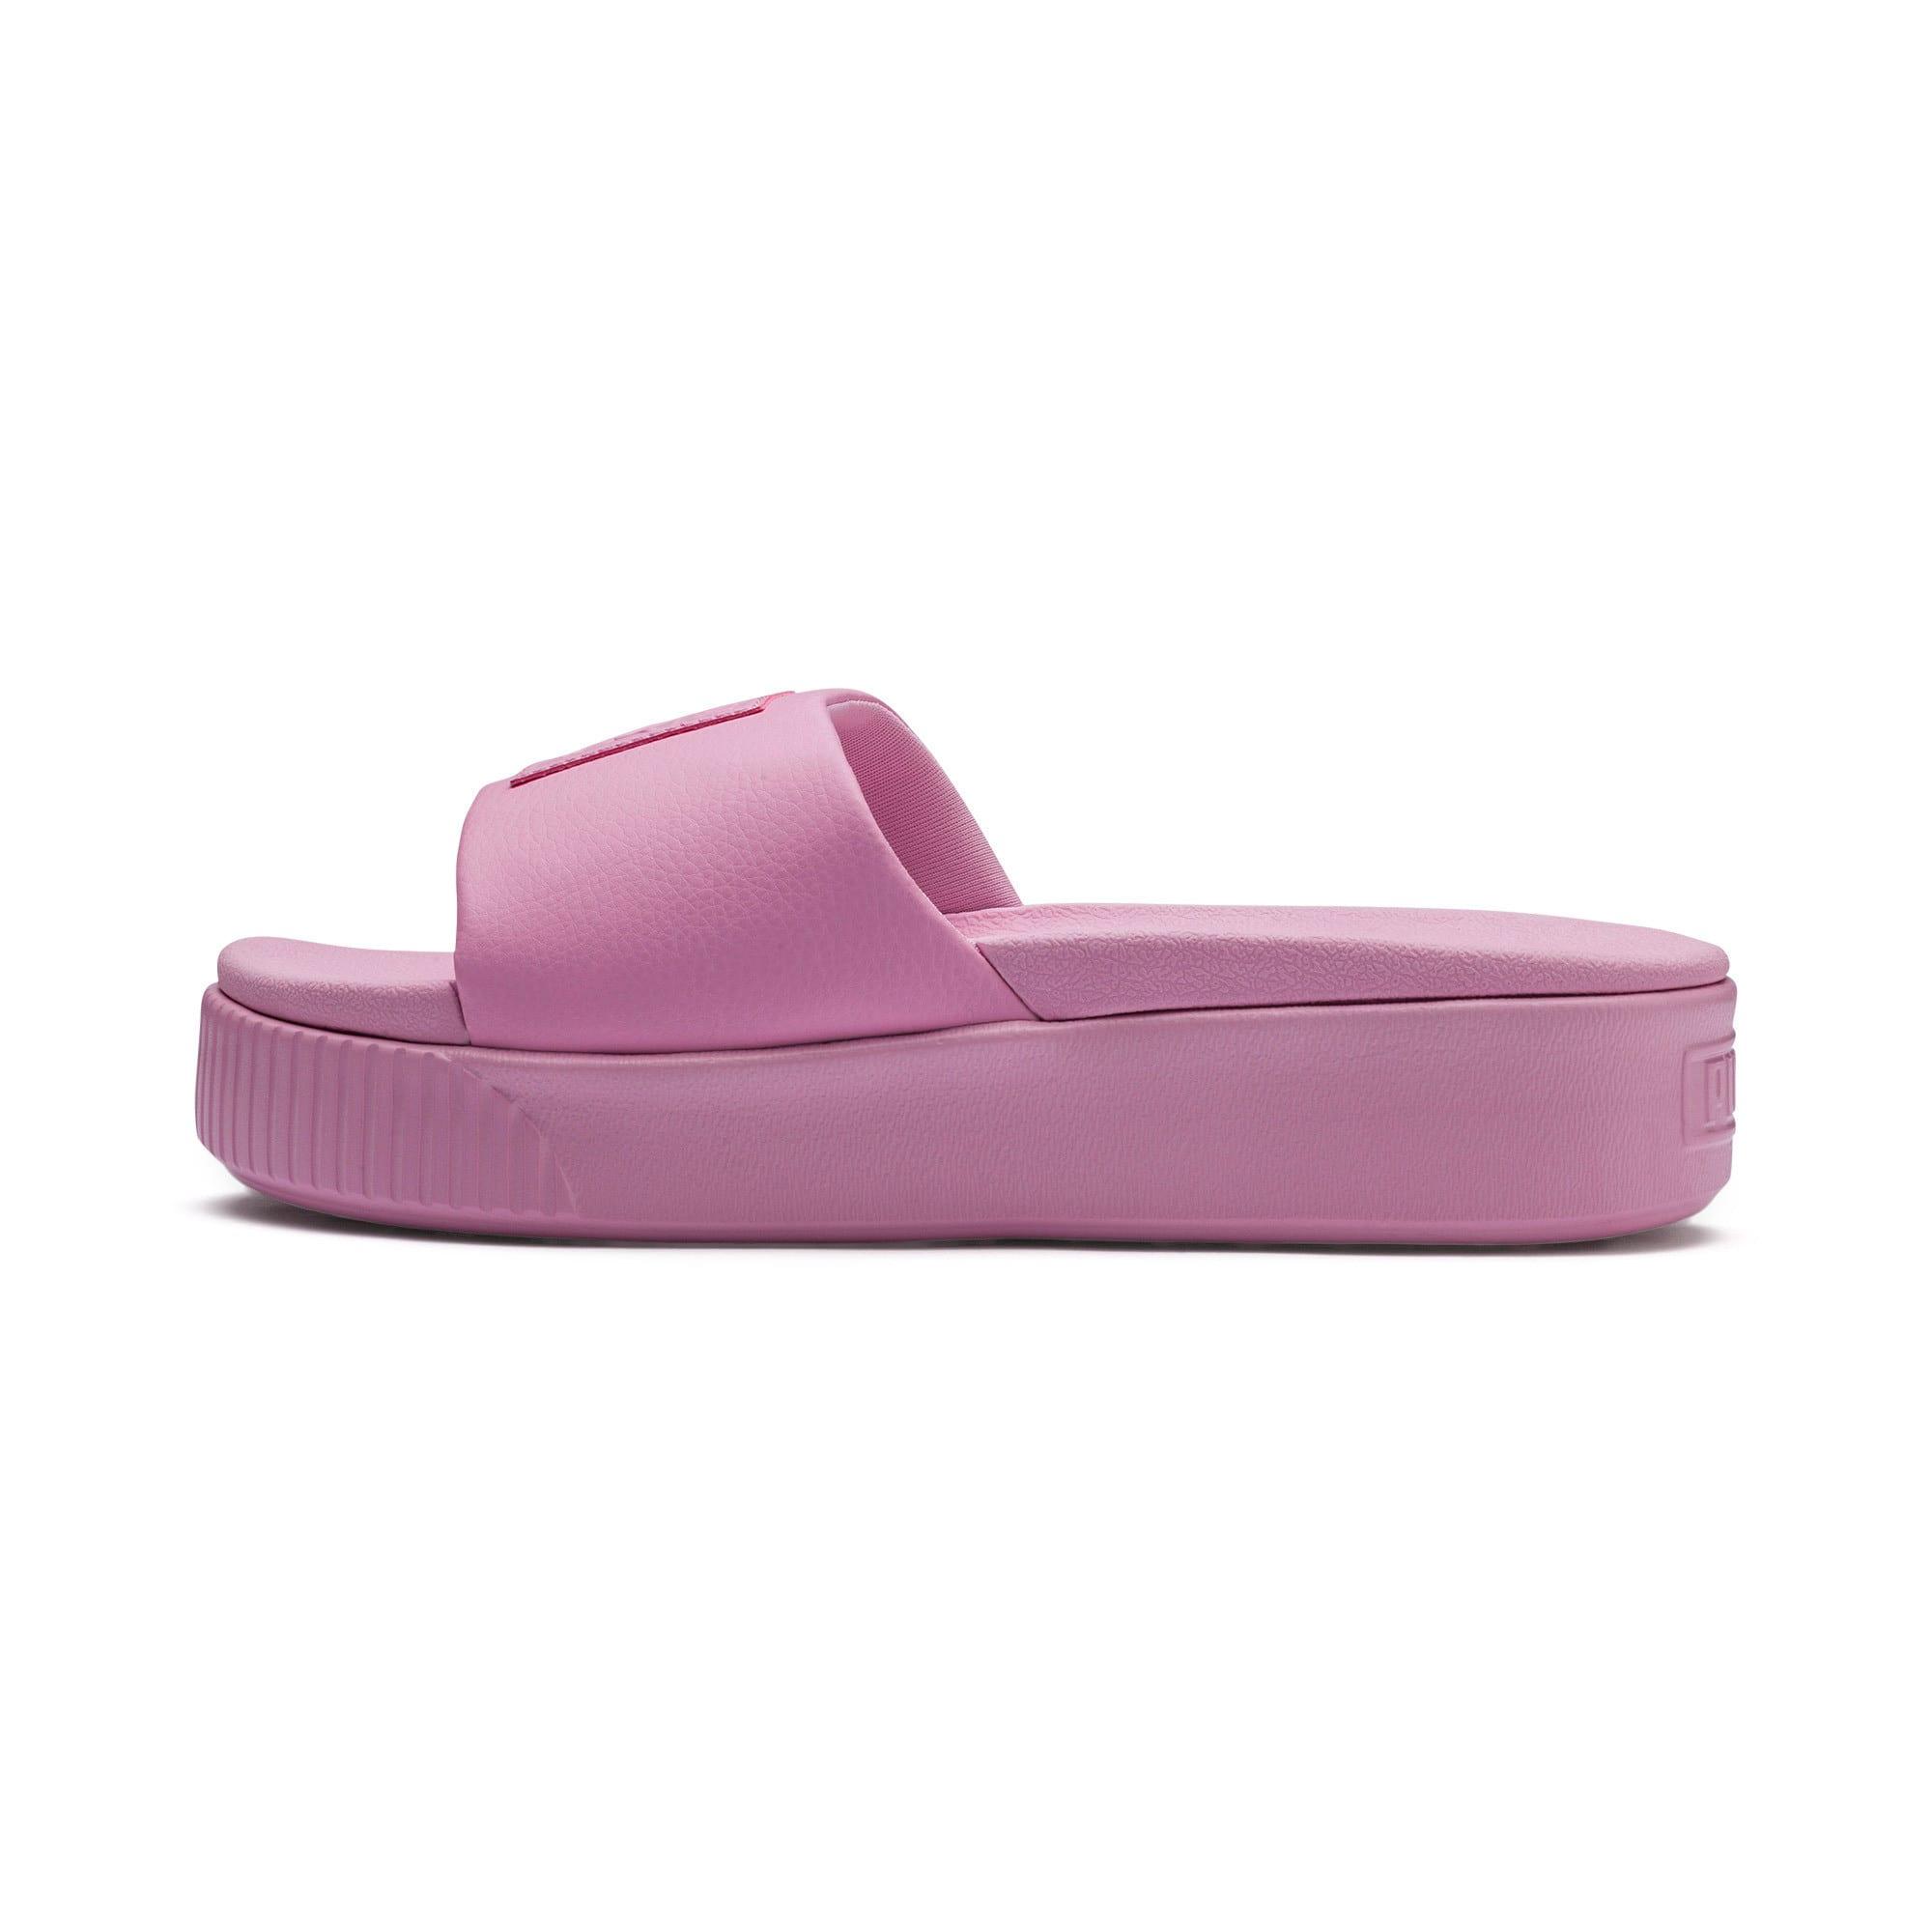 Miniatura 1 de Sandalias con plataforma Slide para mujer, Pale Pink-Pale Pink, mediano